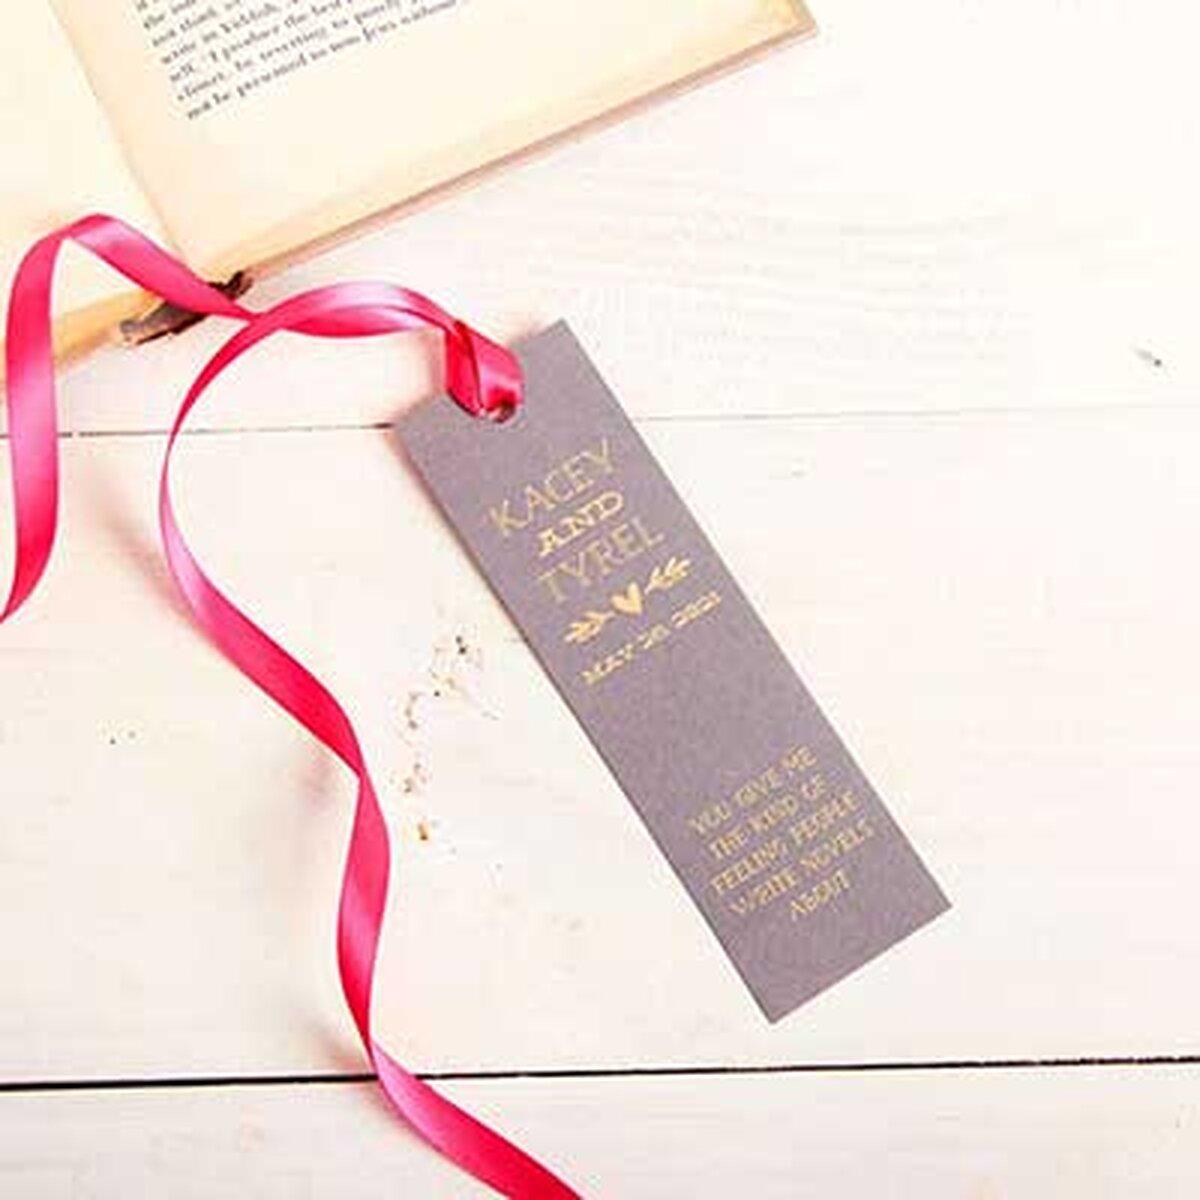 bookmark wedding favors - Roho.4senses.co